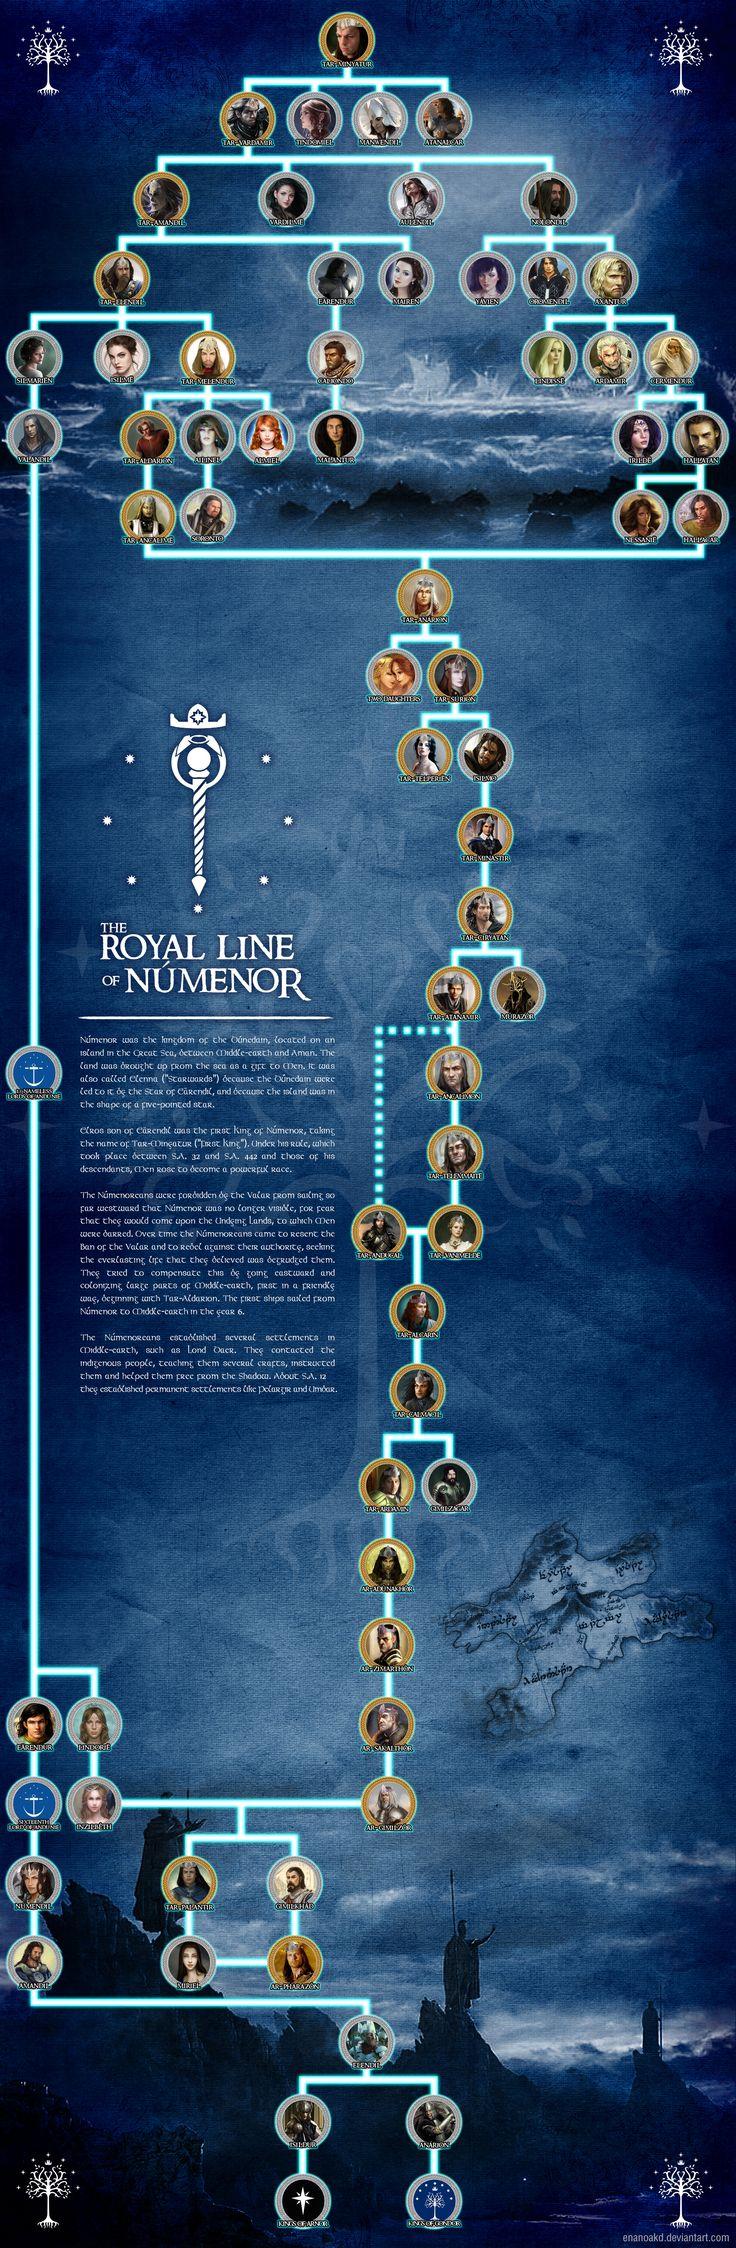 The Royal Line of Numenor by enanoakd.deviantart.com on @deviantART